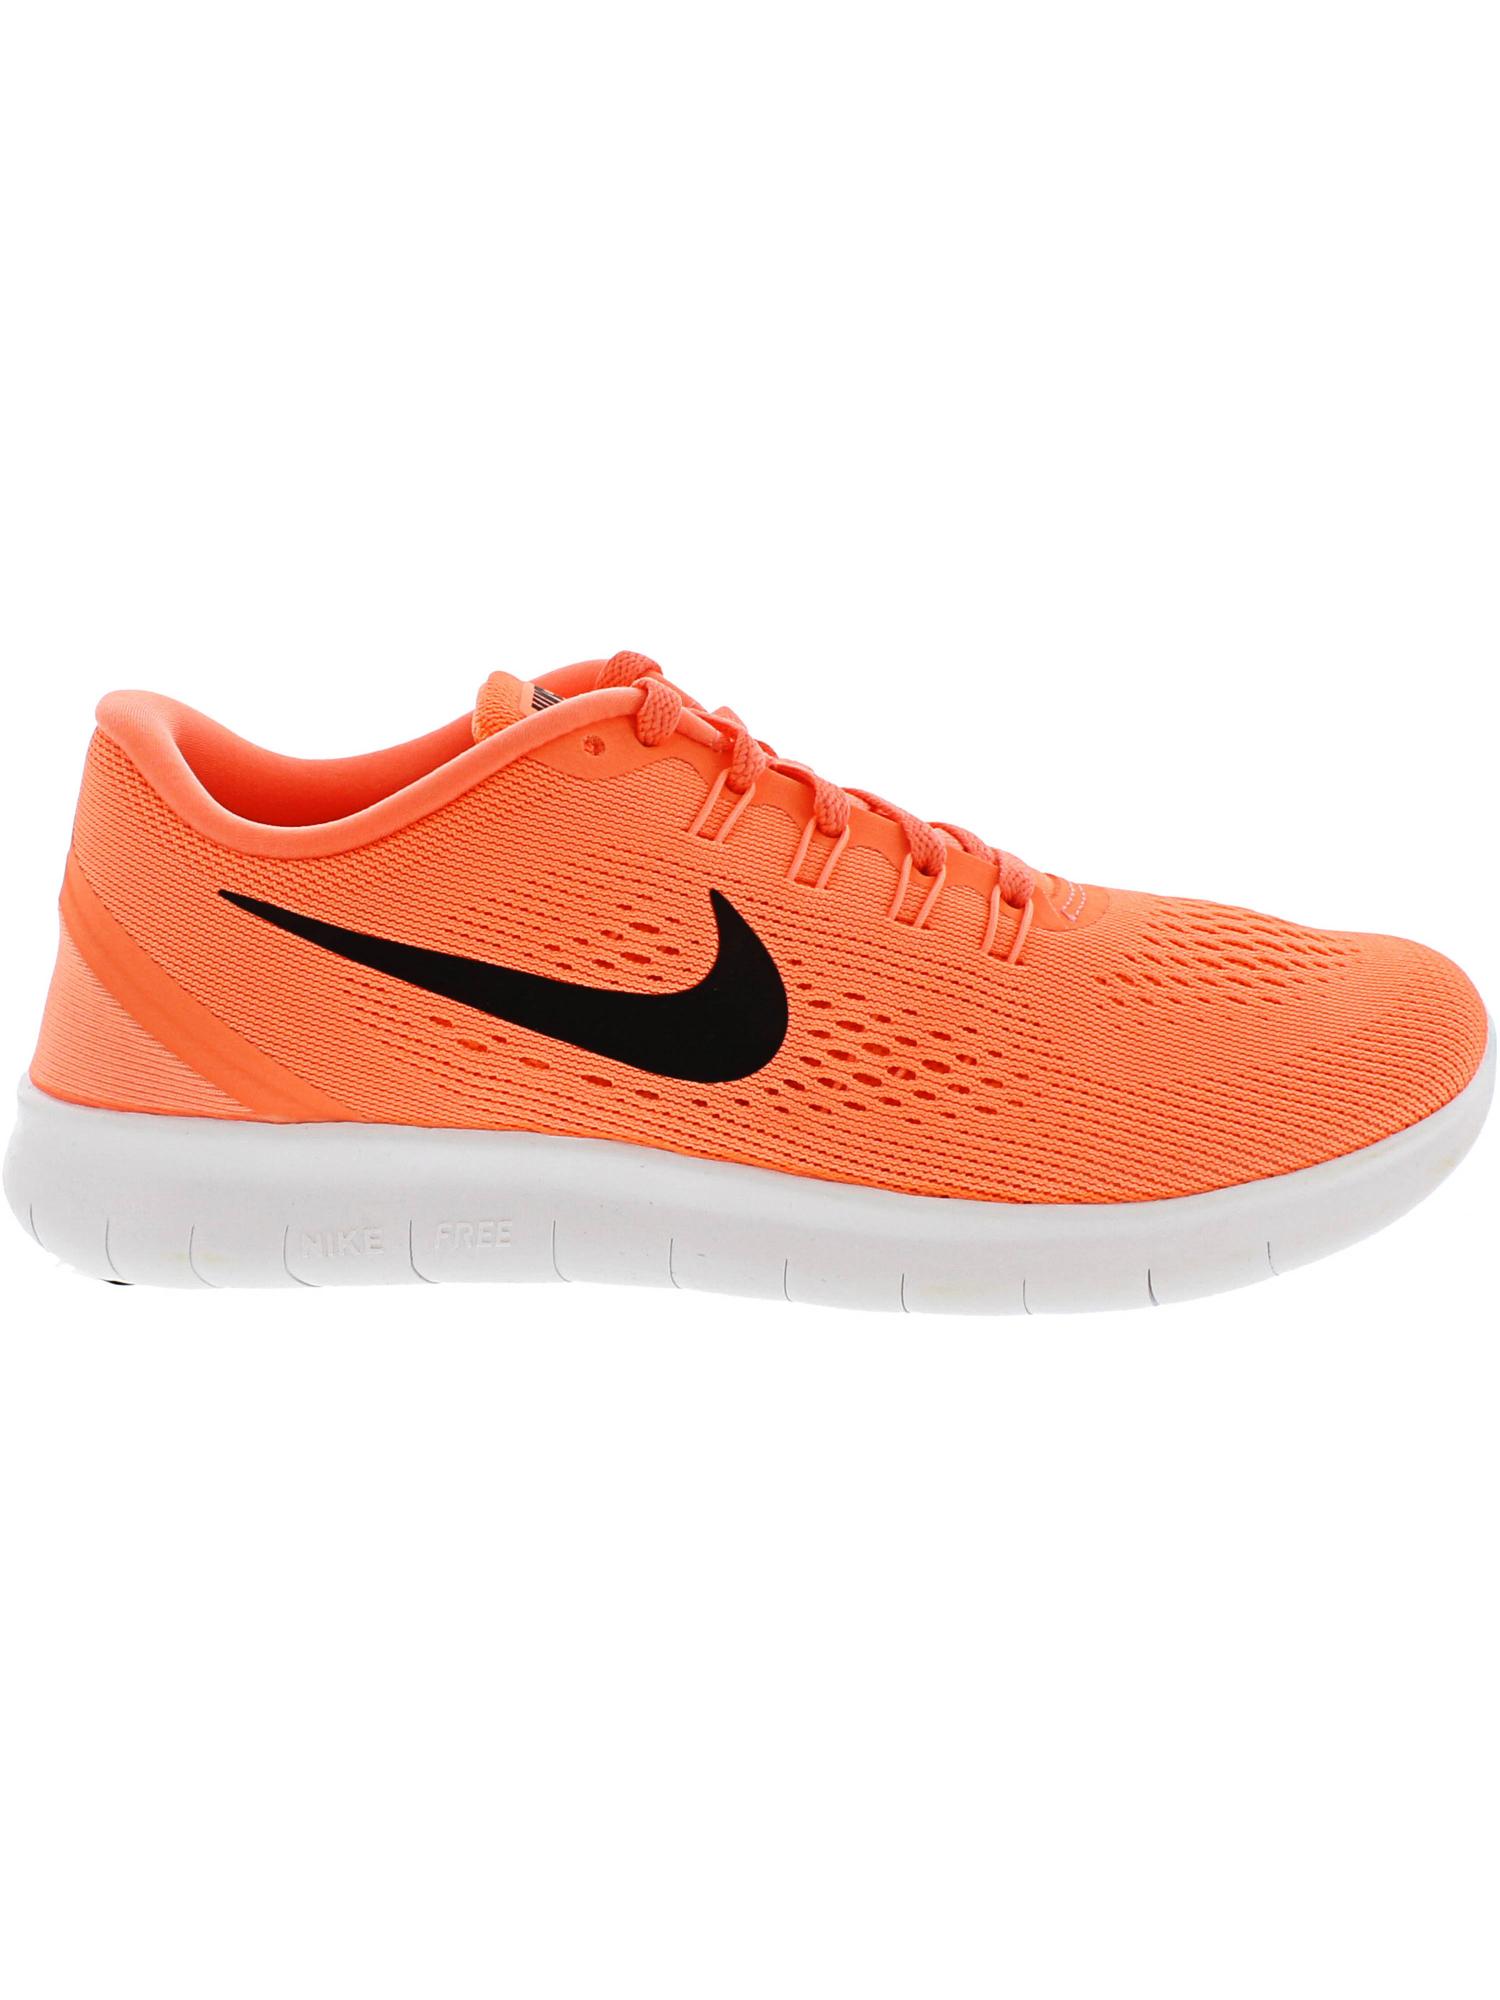 buy online 477ca eb4b8 ... Nike Women s Women s Women s Free Rn Ankle-High Running shoes 541d02 ...